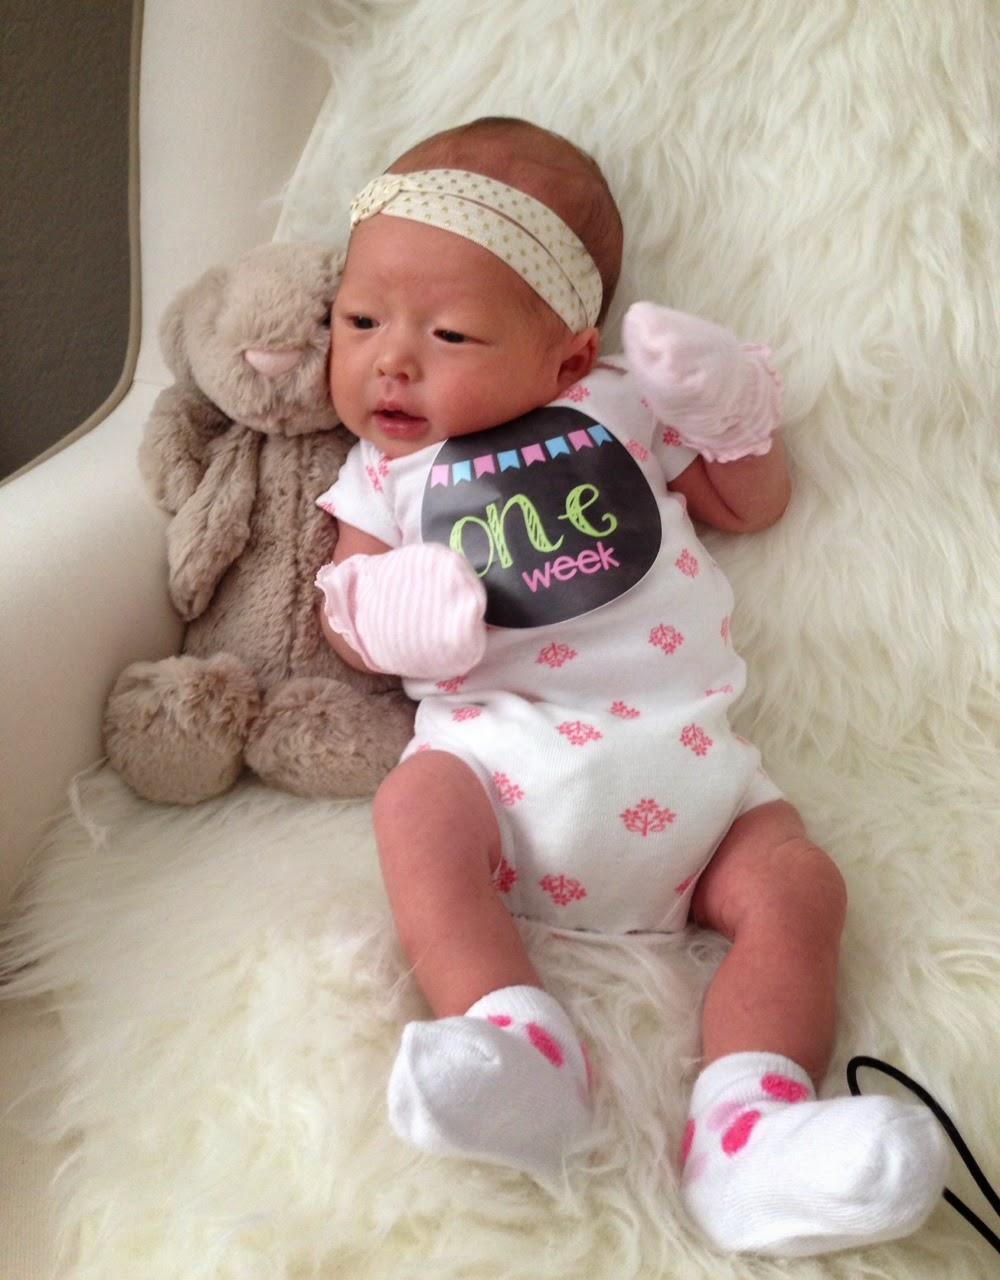 brynn is 1 week old the little gilland